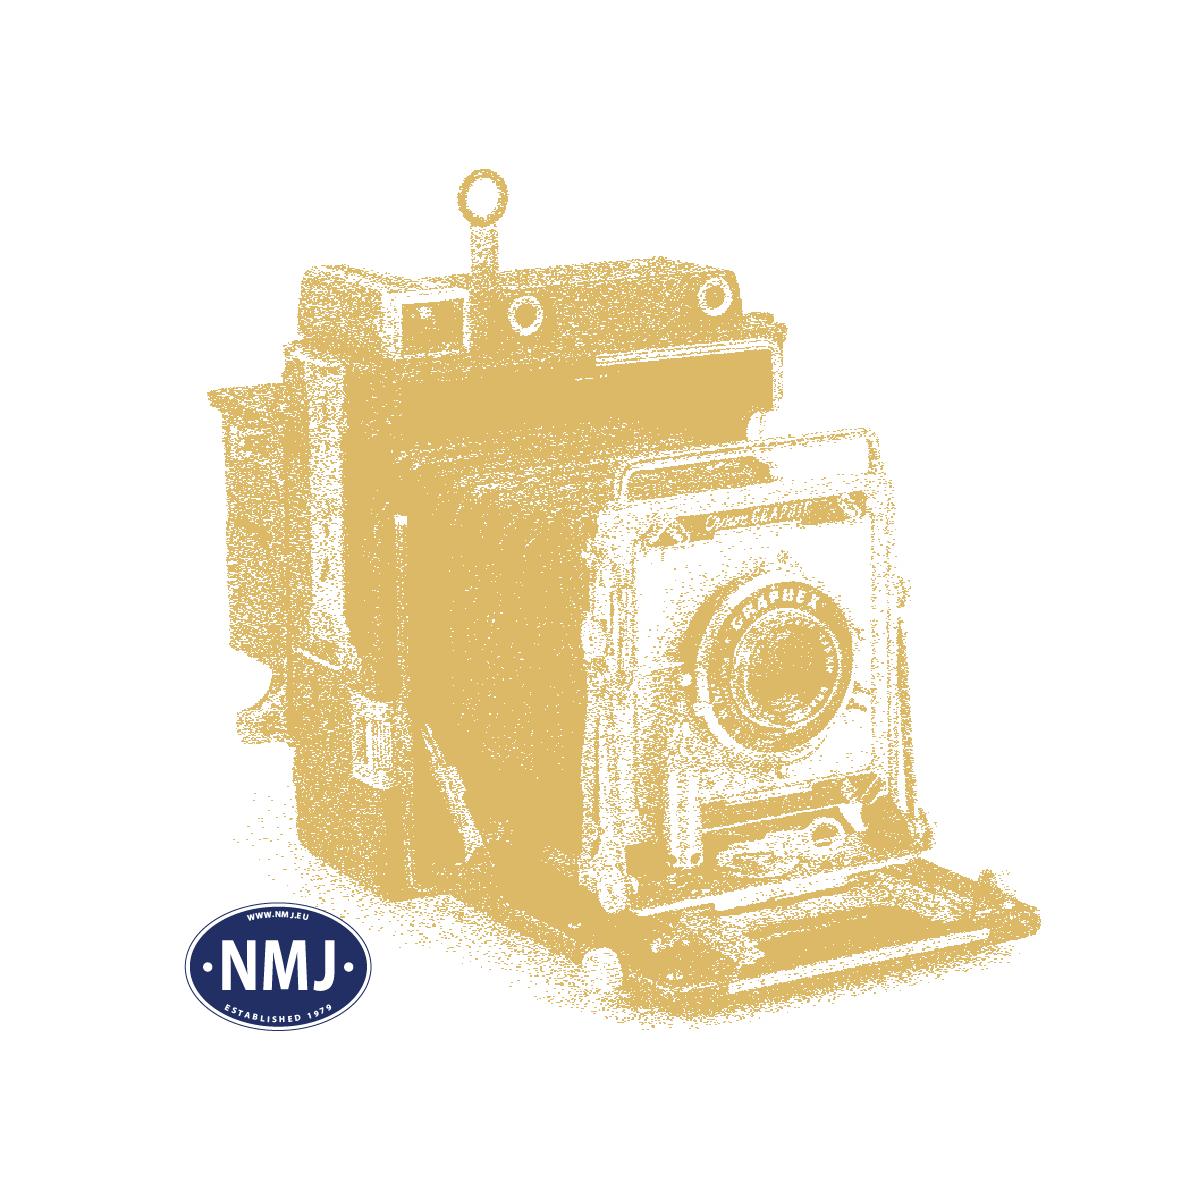 NMJT245301 - NMJ Topline CFL 1602, Spur 0, DCC m/ Sound